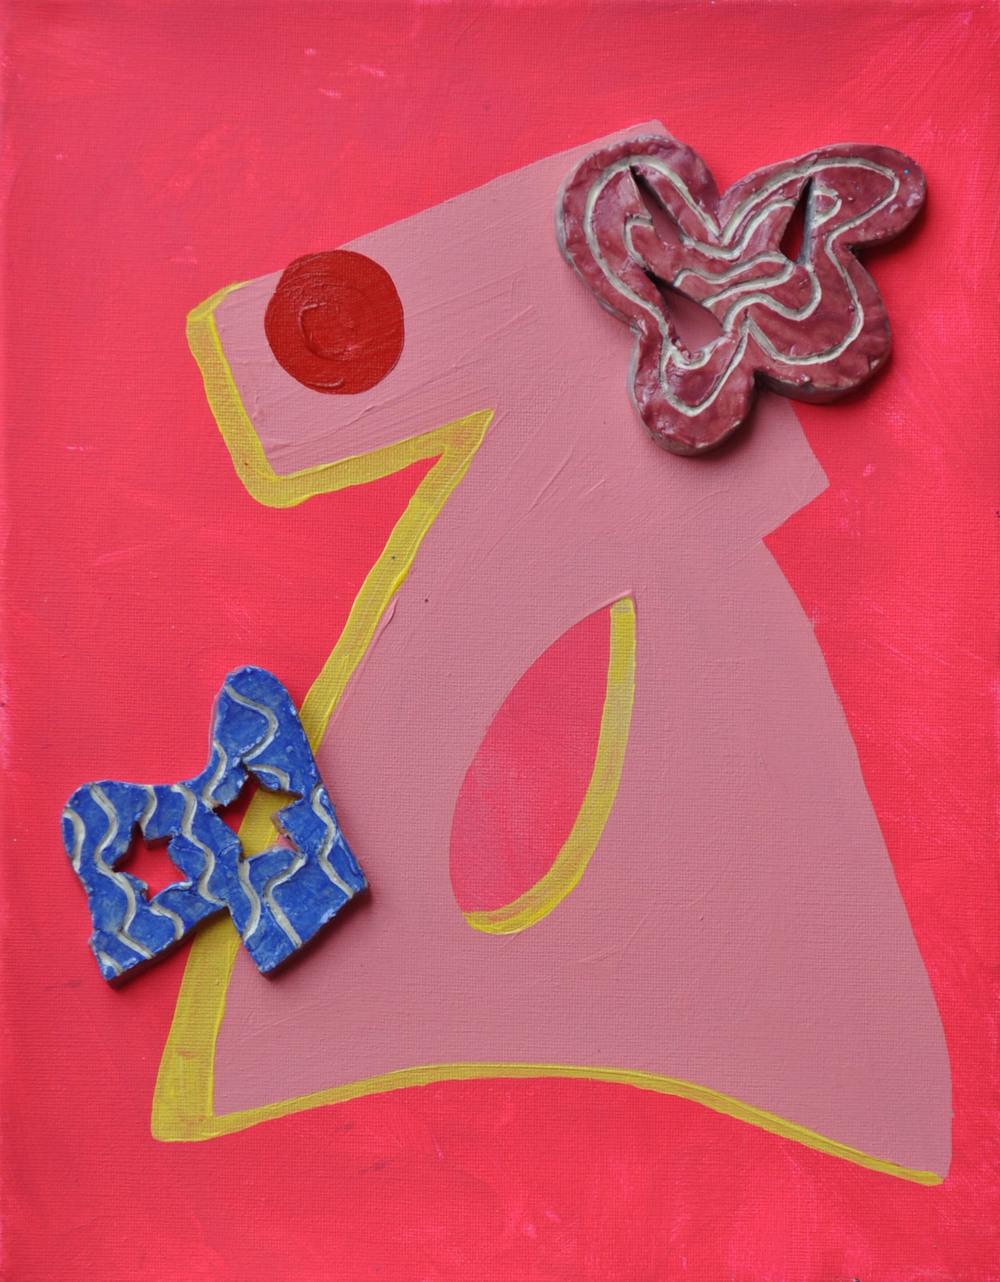 "Acrylic and ceramic on canvas | 11x14"" | 2016"